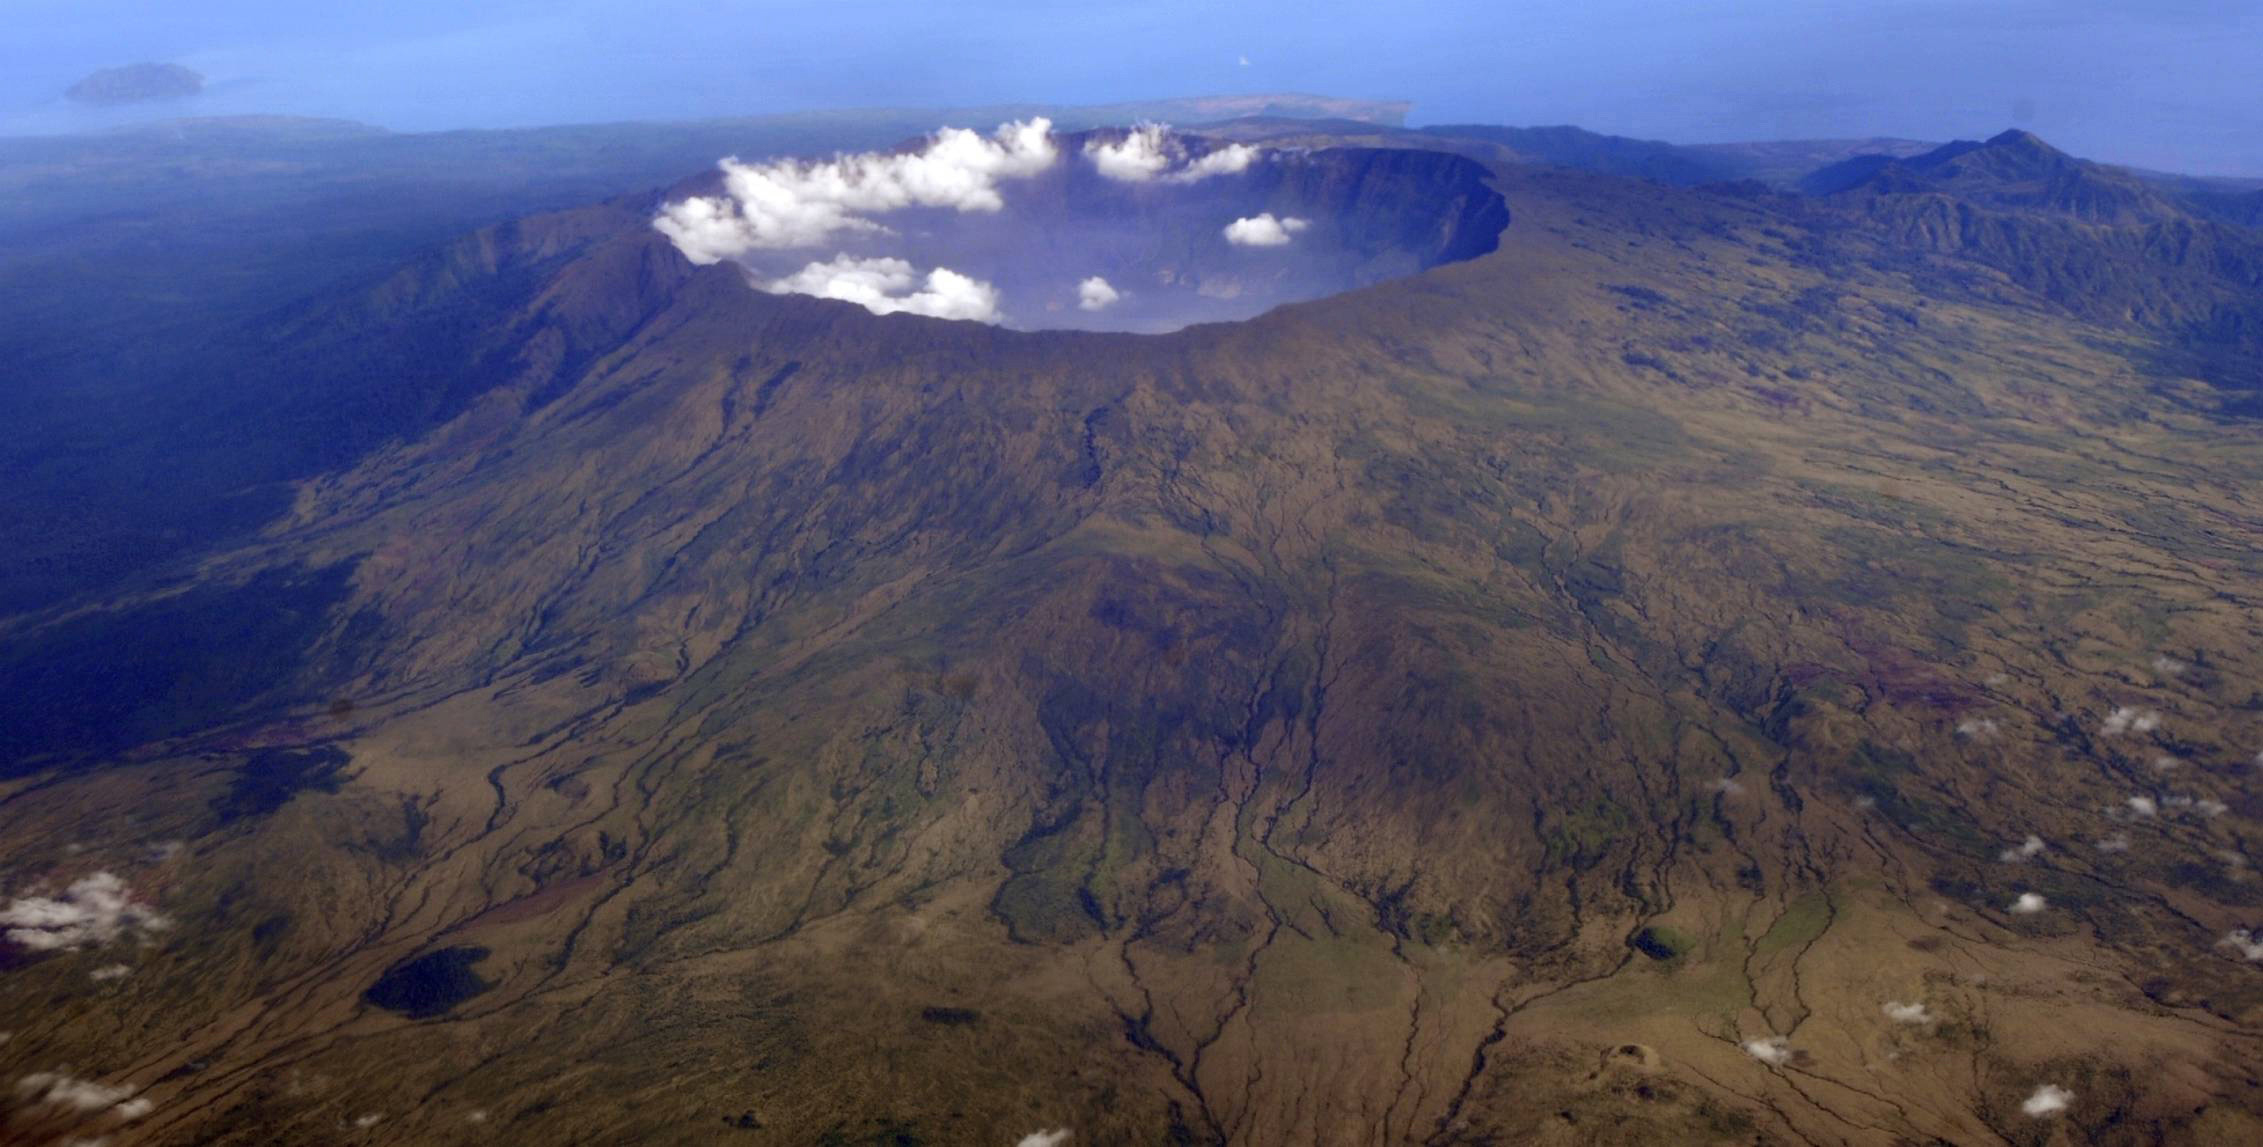 The Deadliest Volcanic Eruption in History